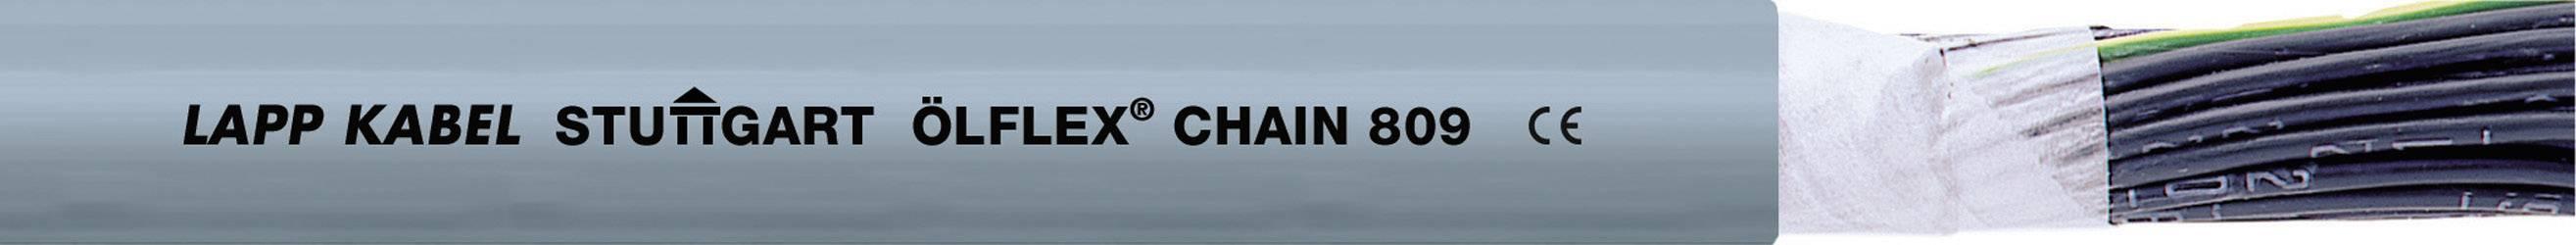 Žíla kabelu LappKabel ÖLFLEX CHAIN 809 12G1,5 (1026729), 12x 1,5 mm², PVC, Ø 12,3 mm, 50 m, šedá